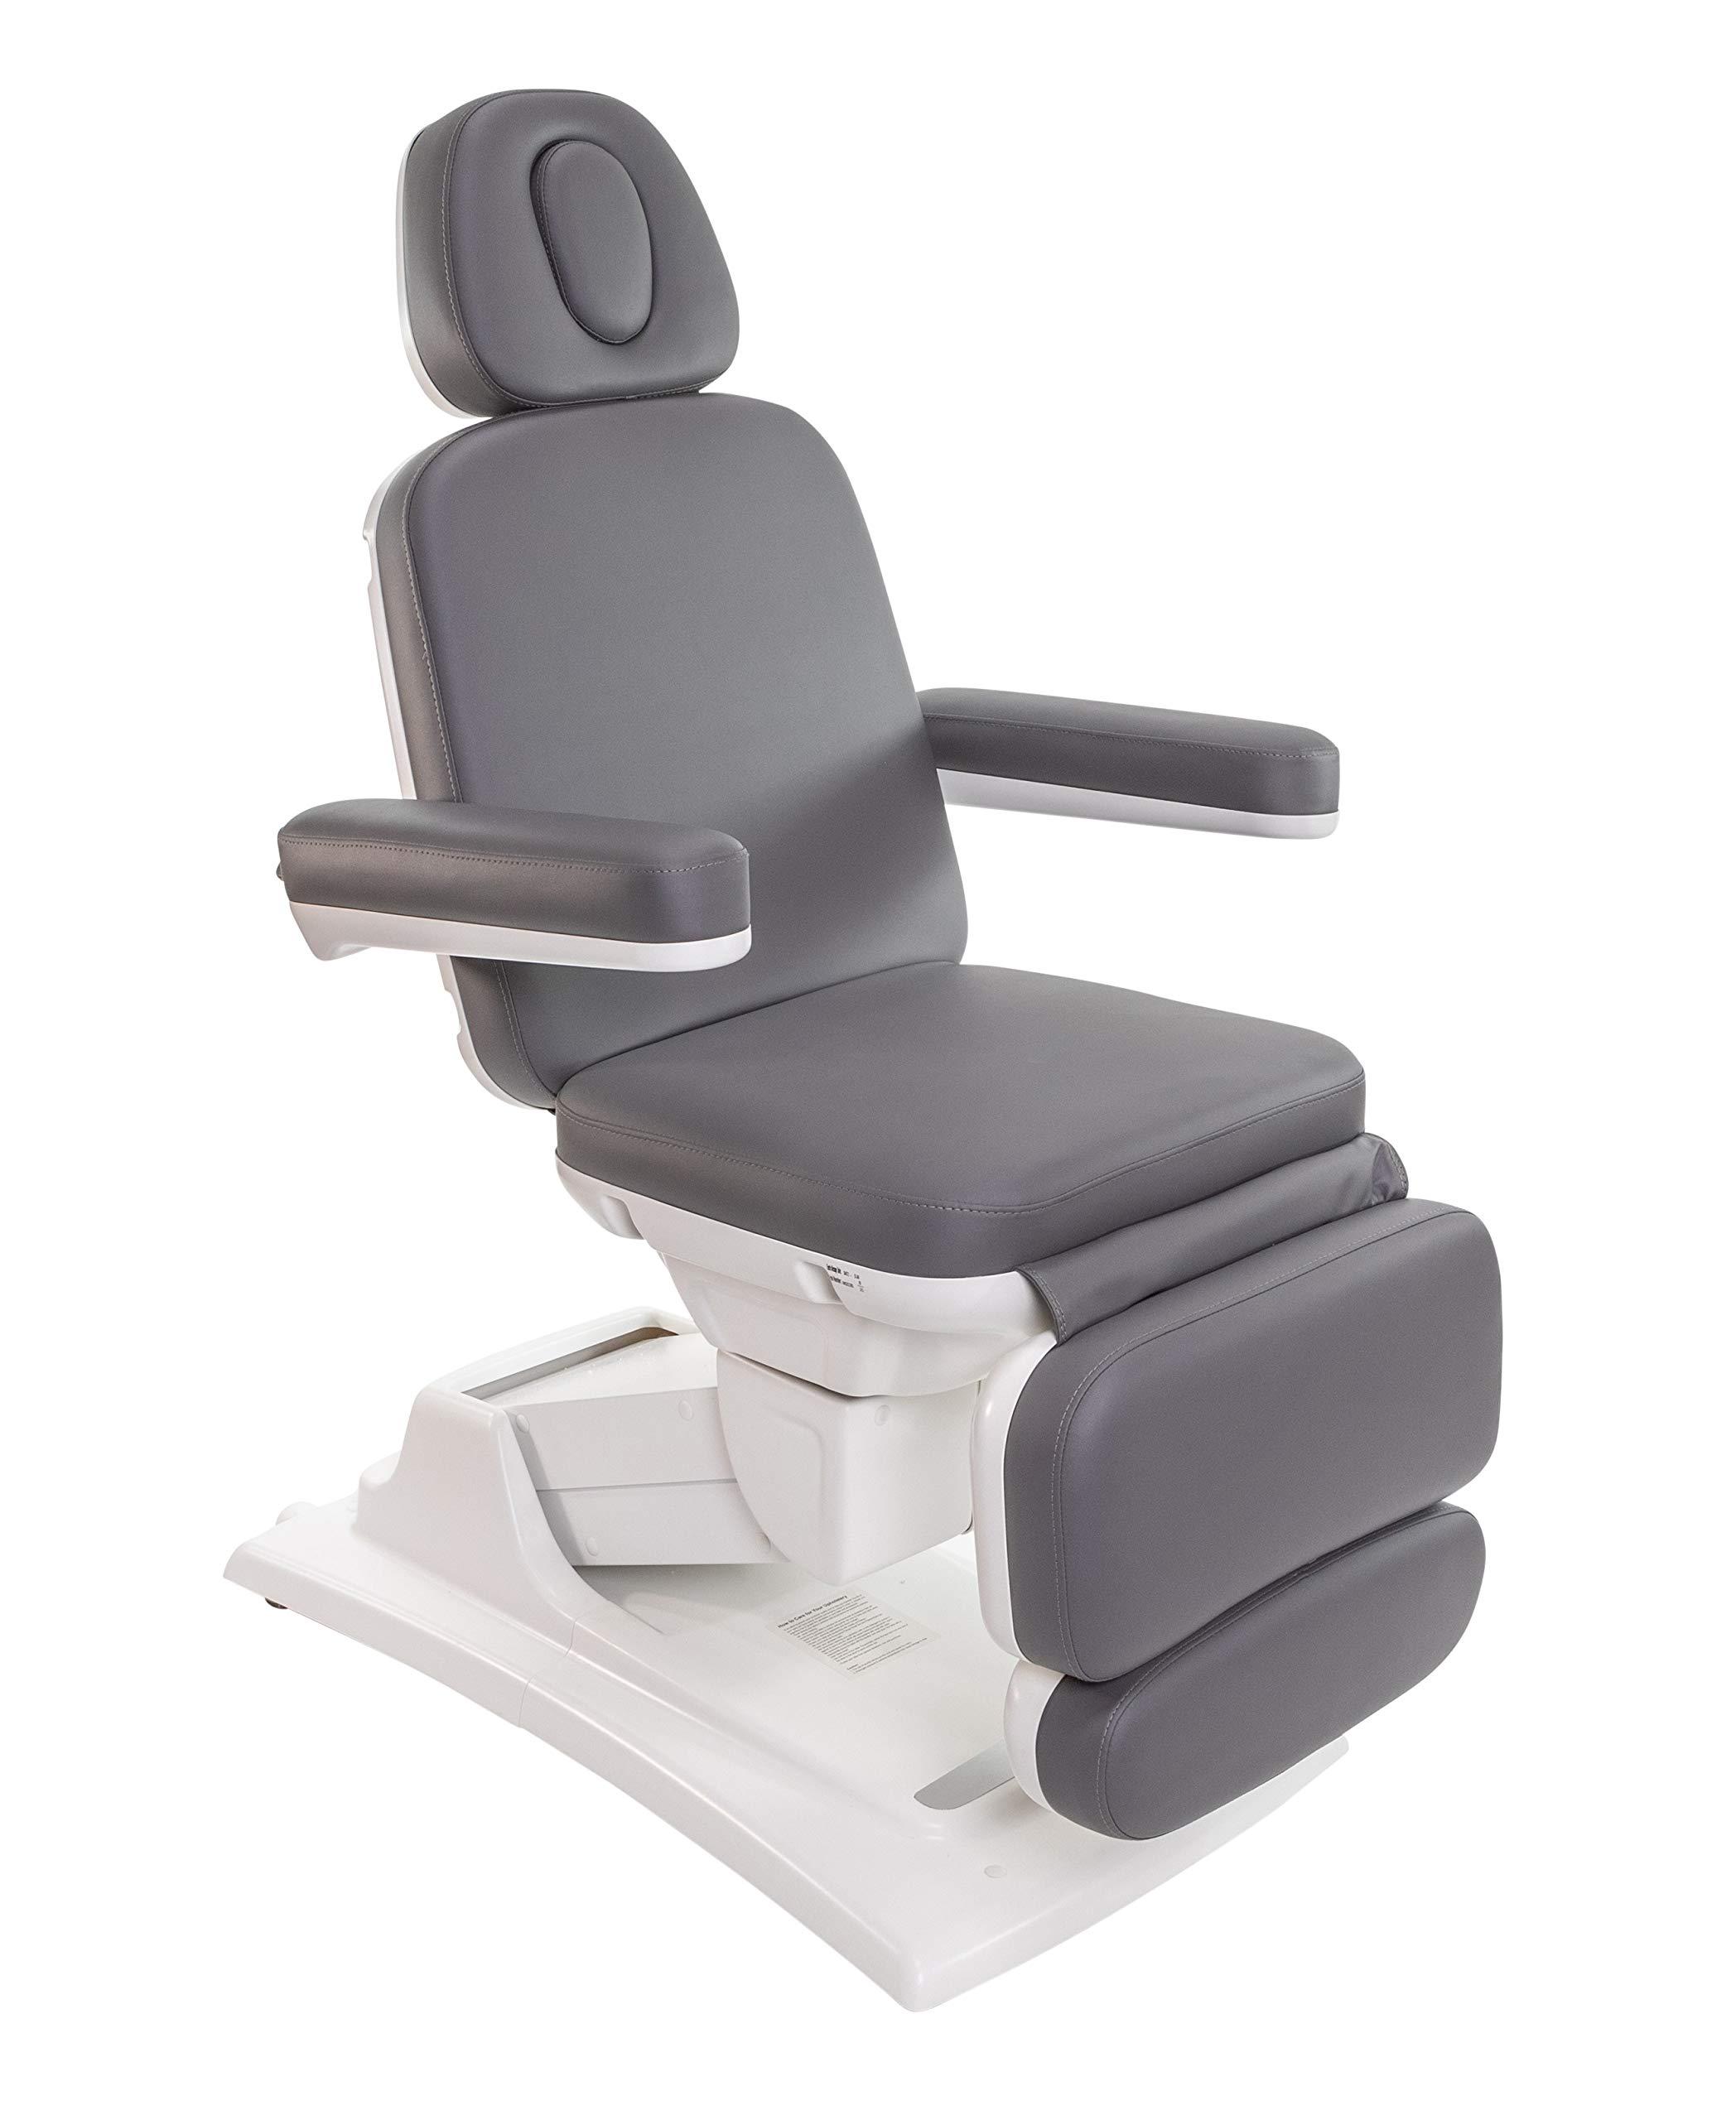 Sibella Medi Spa Electric Exam Chair Facial Bed (Charcoal)